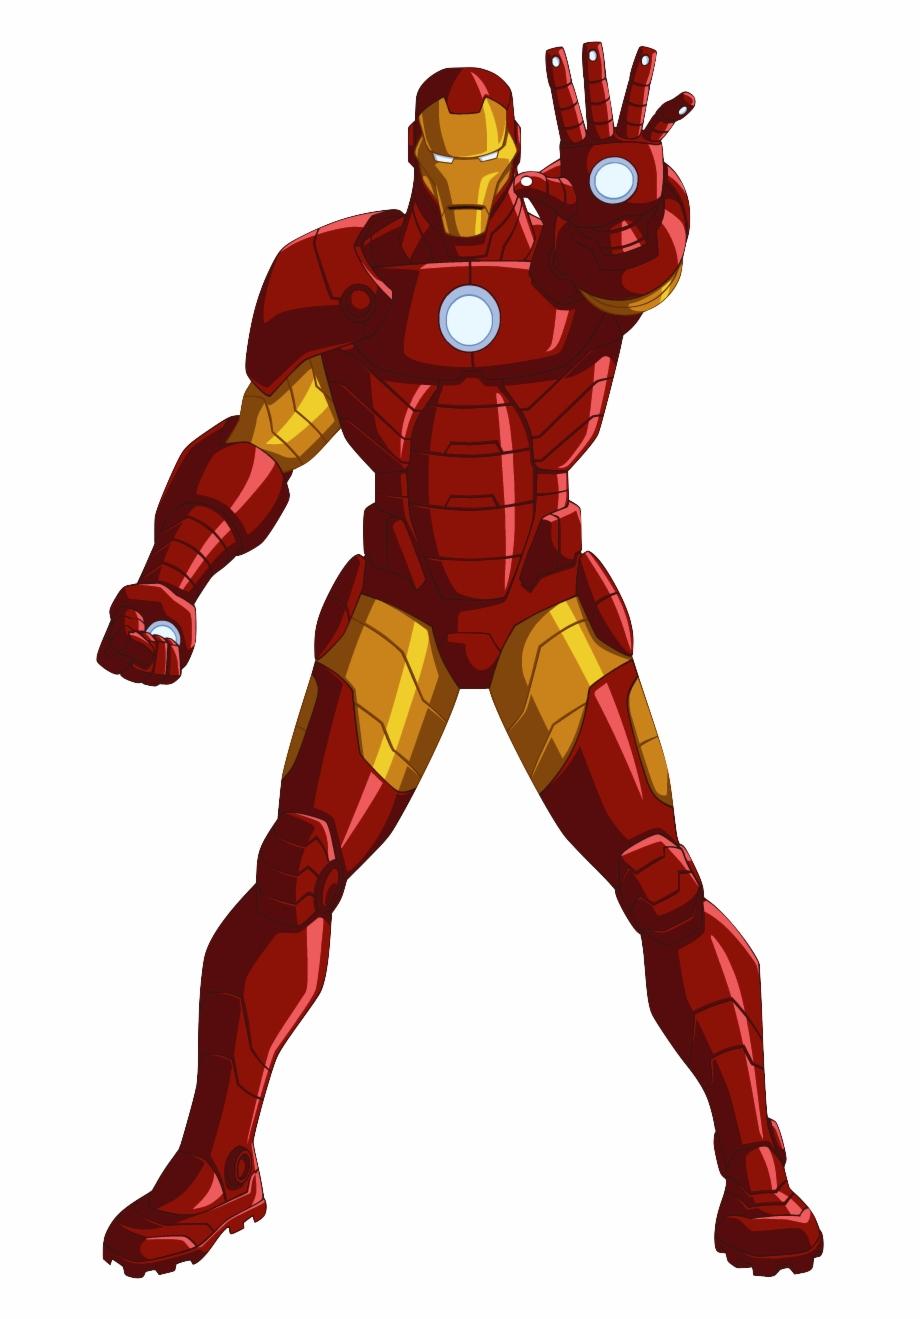 Clipart iron man image free stock Iron Man Clipart 3d Png - Iron Man Cartoon Full Body, Transparent ... image free stock